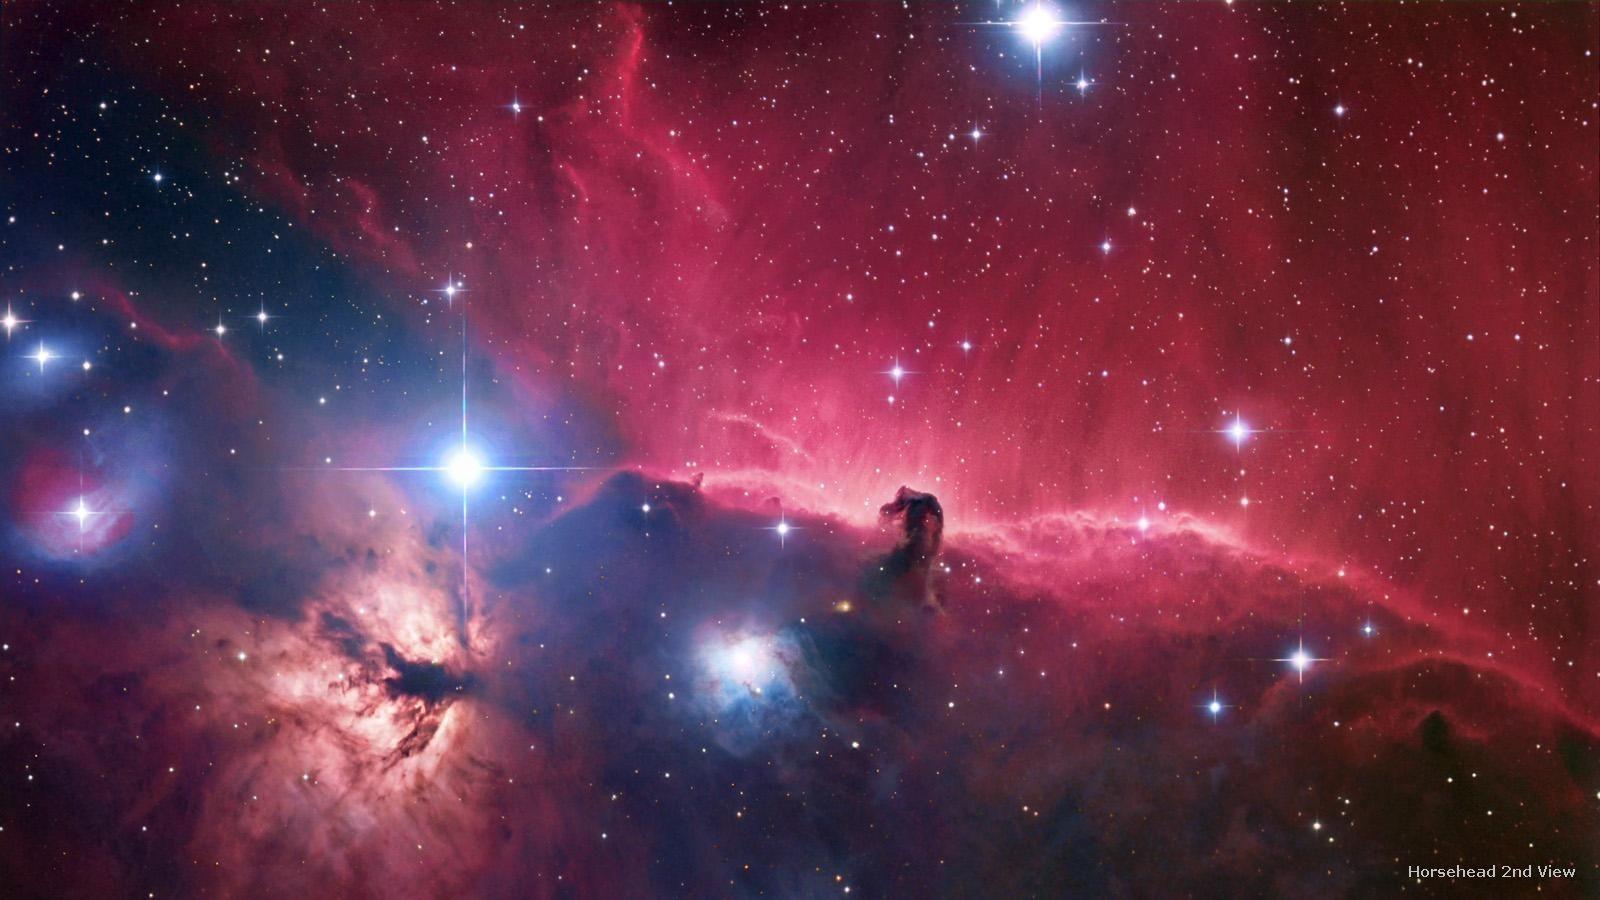 Download Wallpaper Horse Nebula - tumblr_static_nebula__horsehead_2  Best Photo Reference_42736.JPG